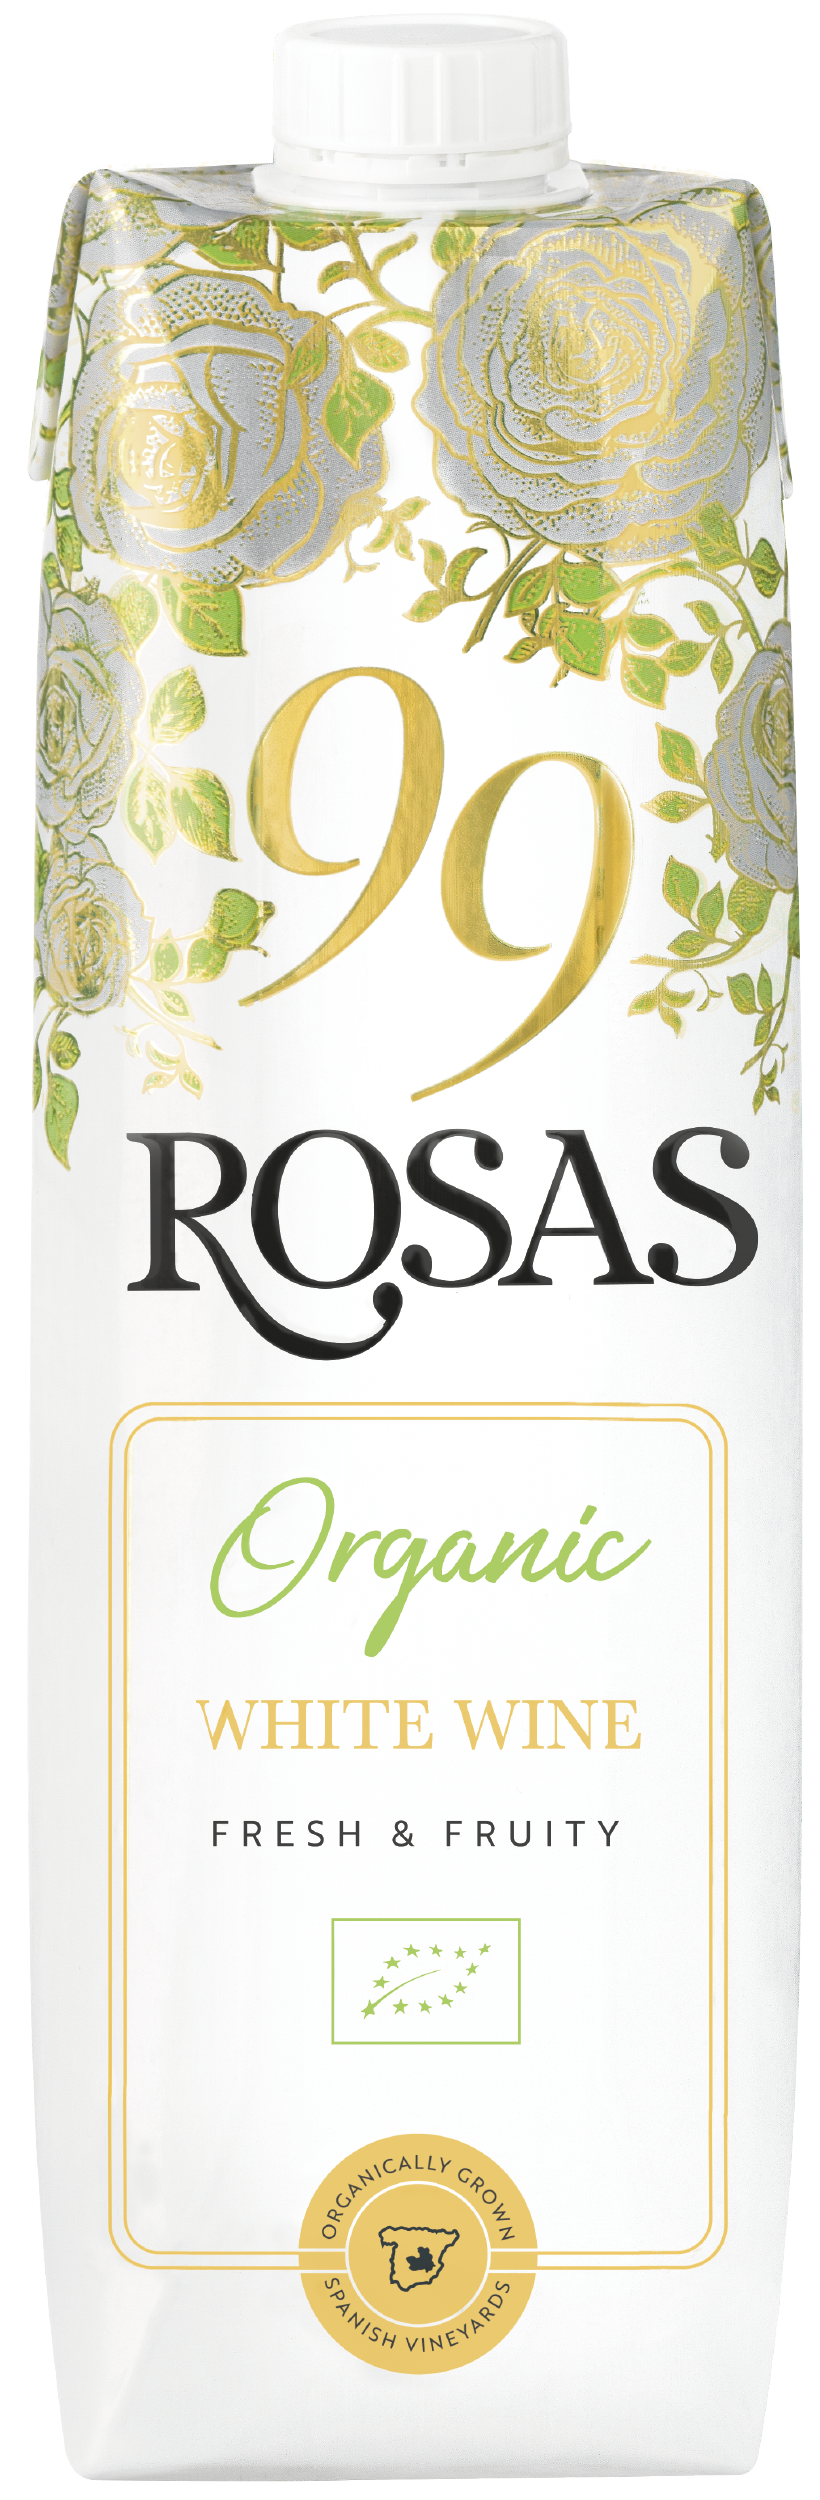 99 Rosas Sauvignon Blanc Chardonnay